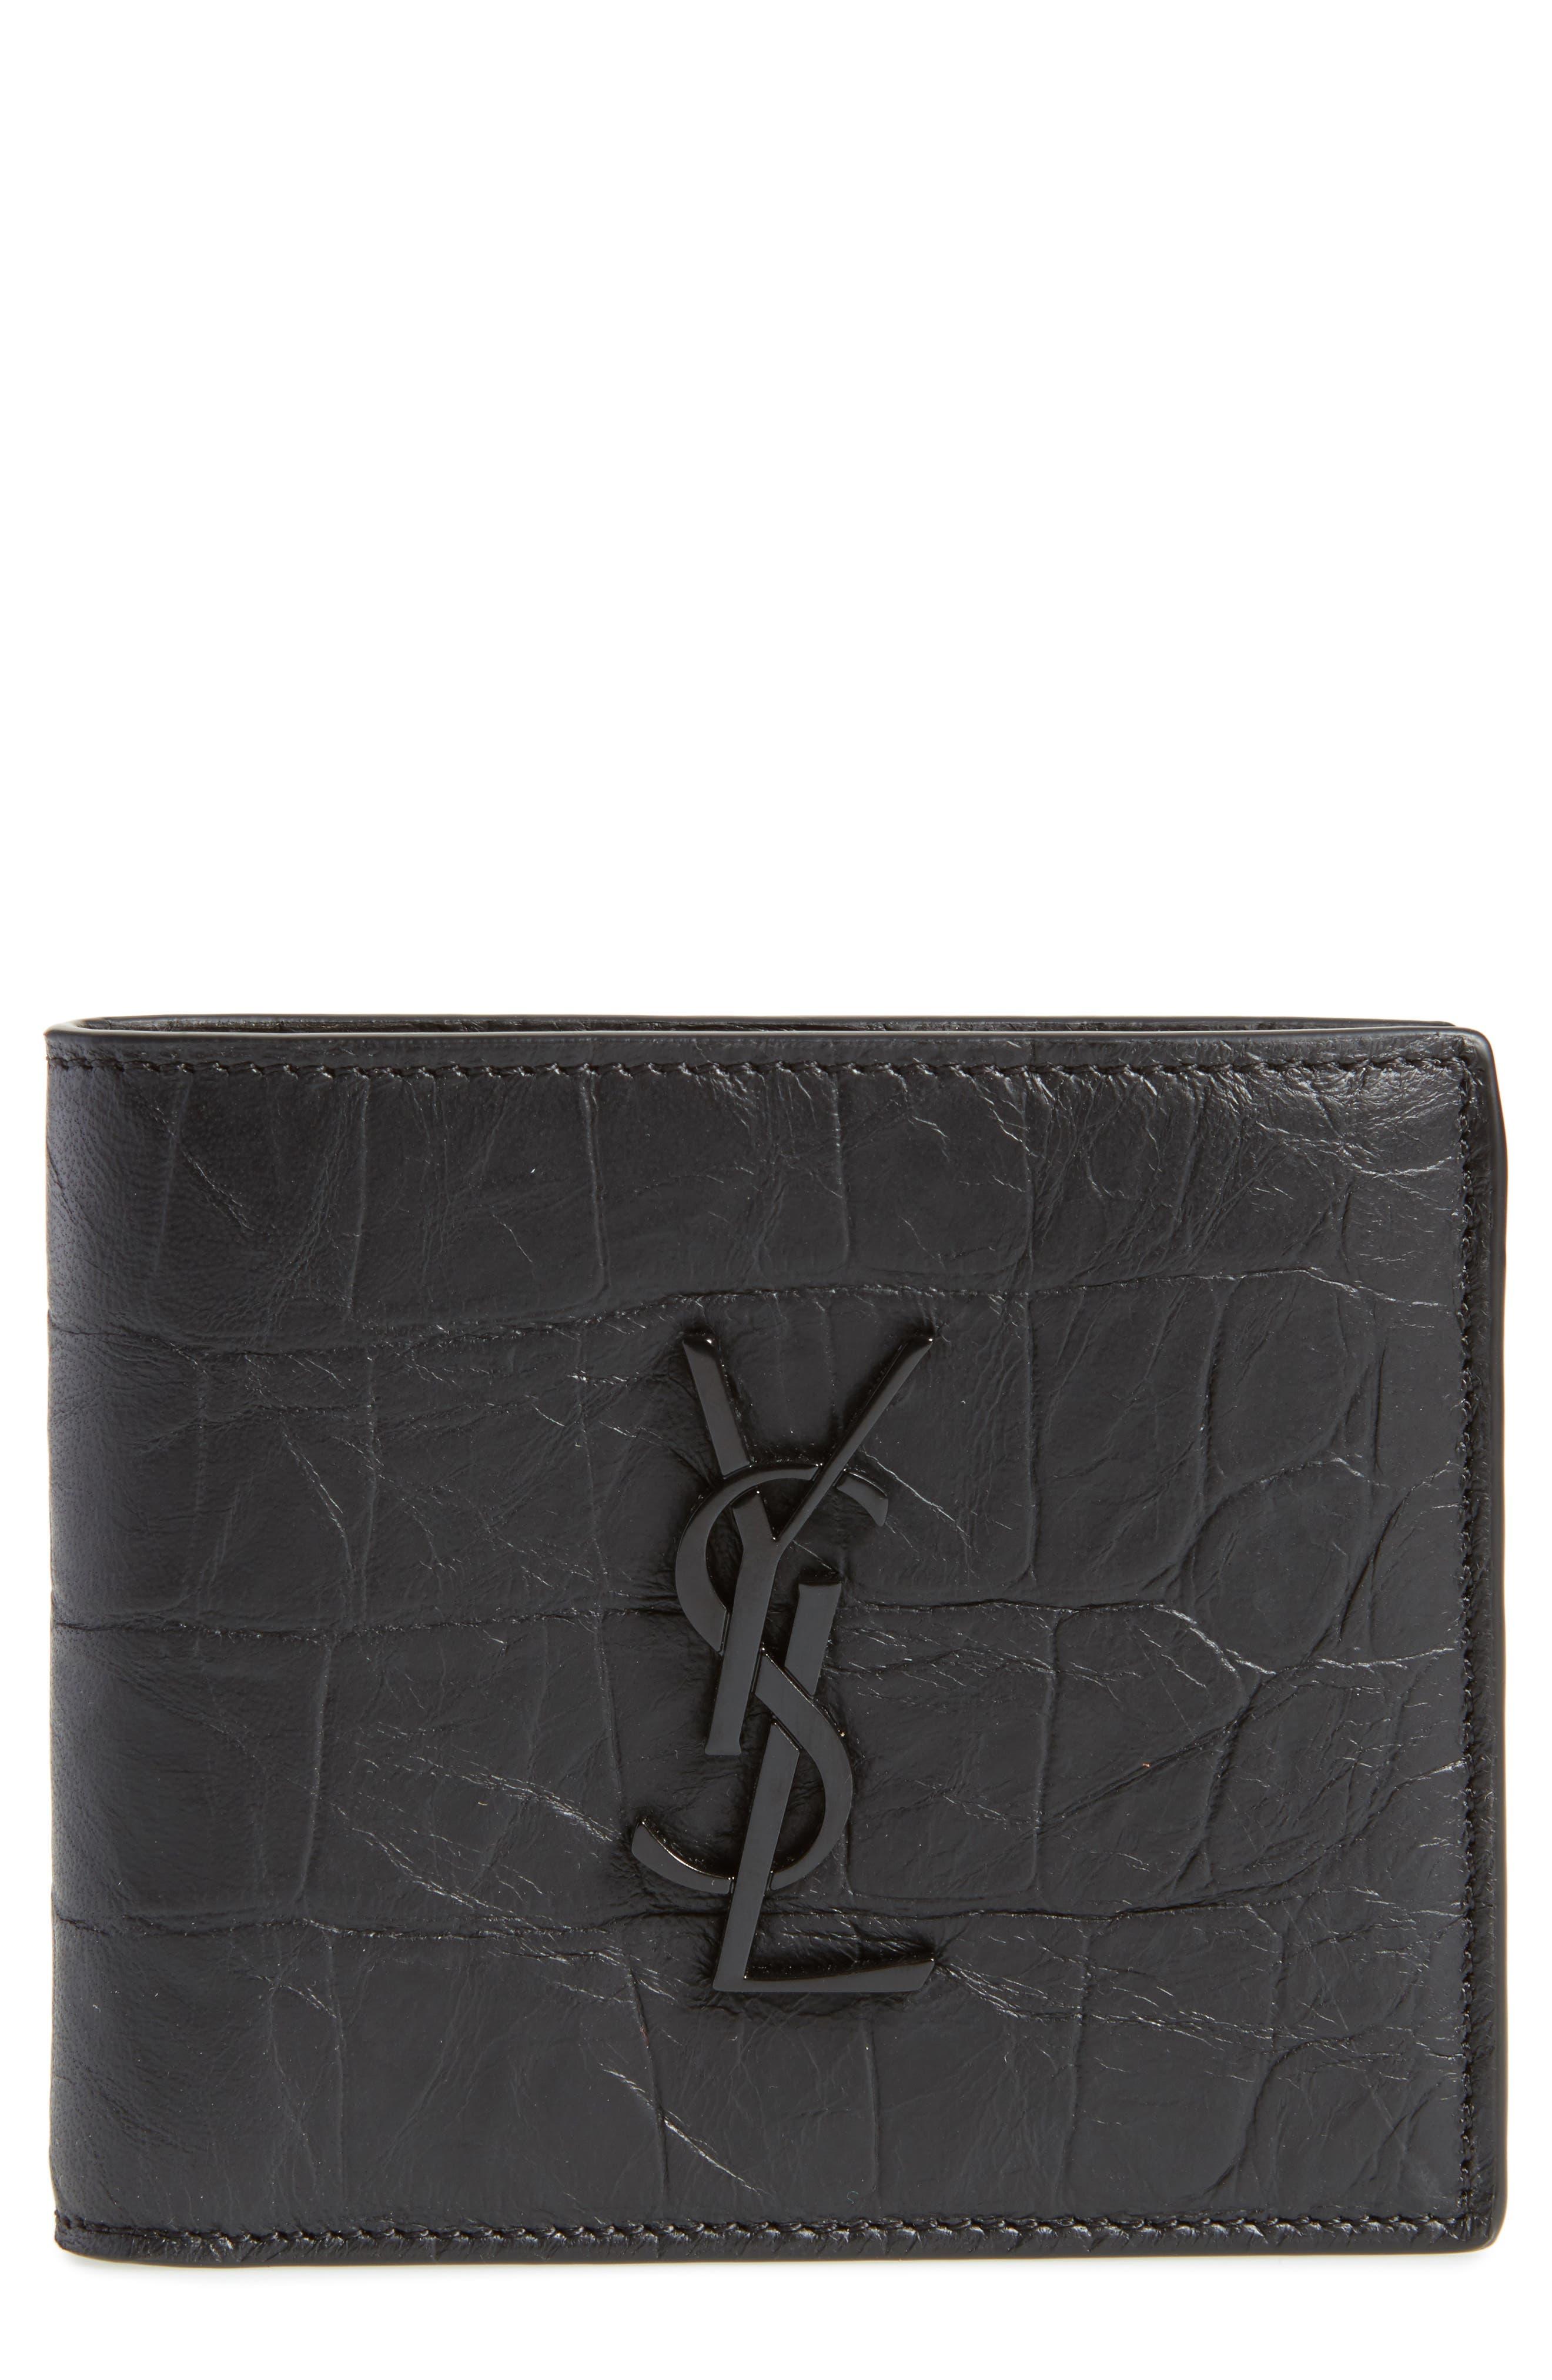 Croc Embossed Leather Wallet,                         Main,                         color, Black